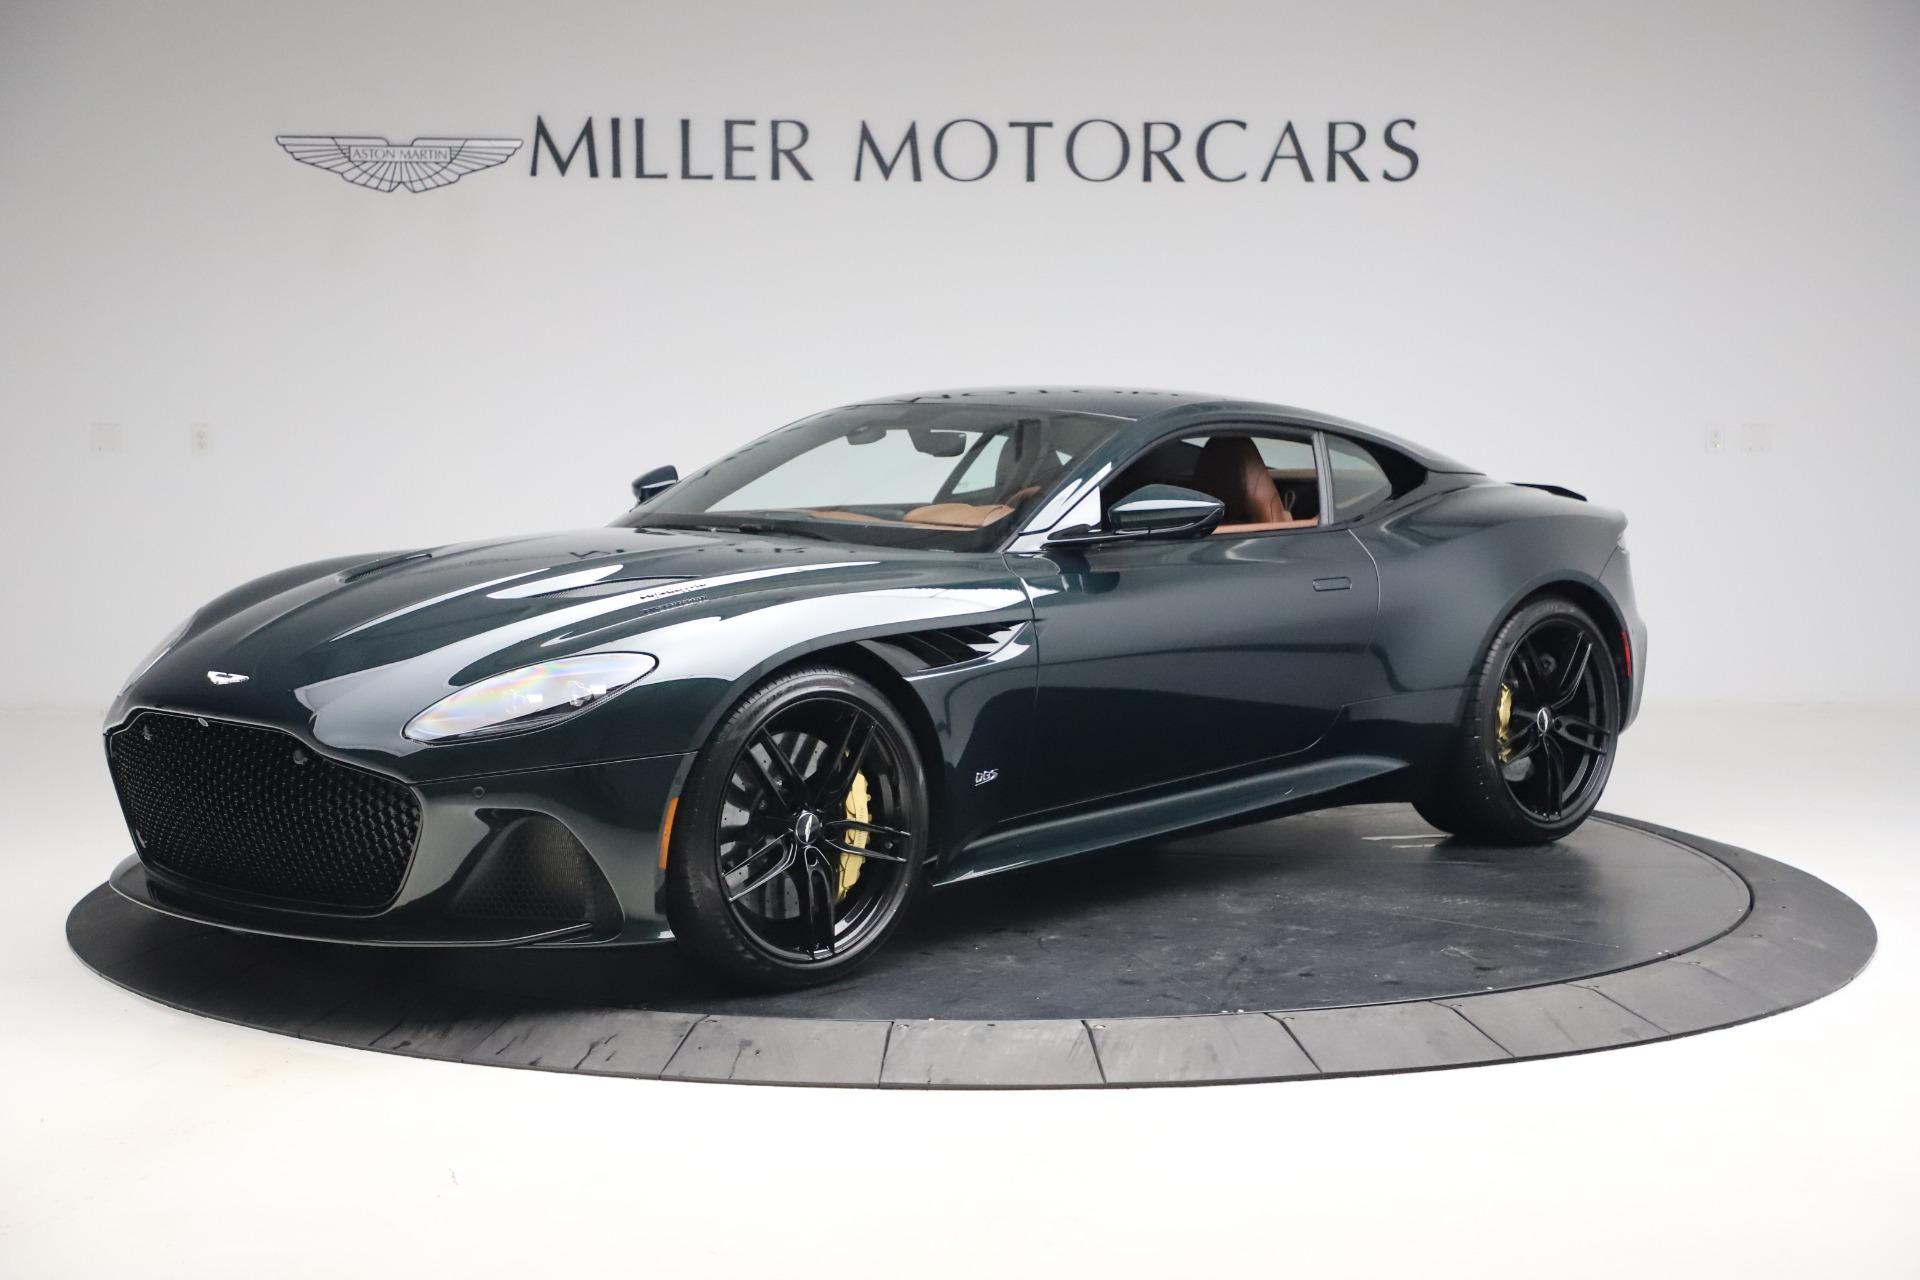 Used 2020 Aston Martin DBS Superleggera for sale $295,900 at Alfa Romeo of Greenwich in Greenwich CT 06830 1